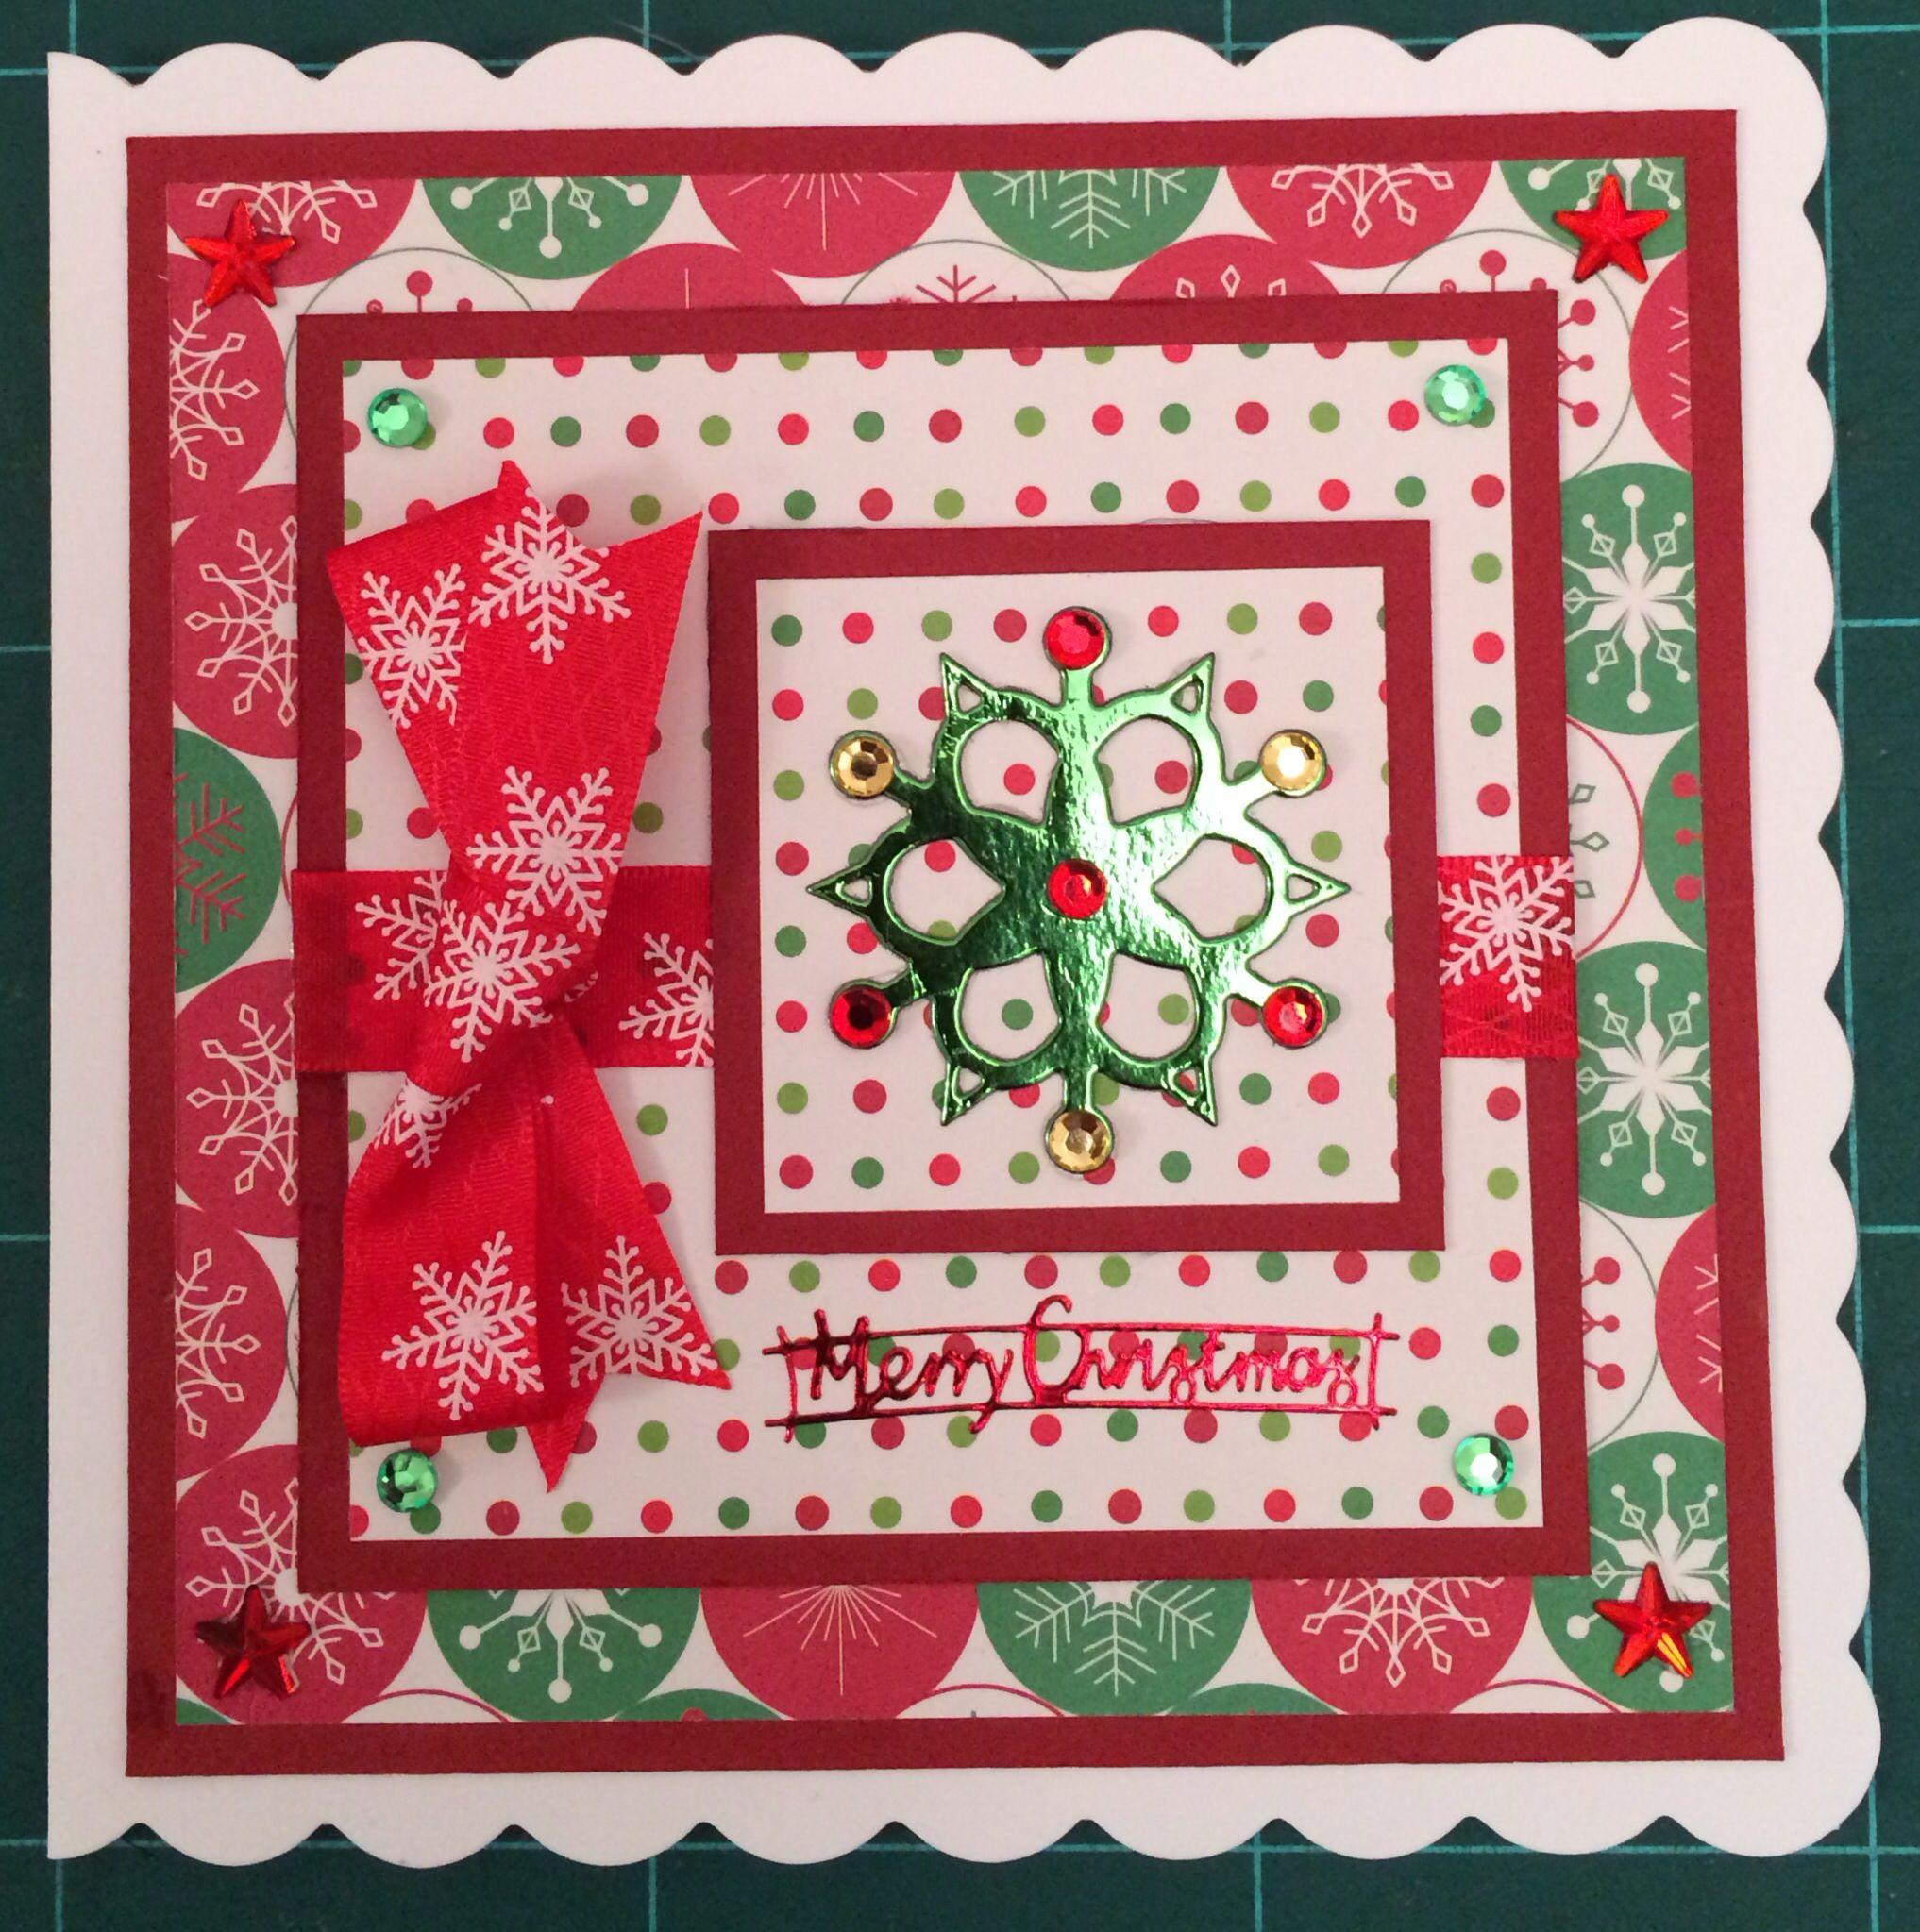 Handmade Snowflake Christmas Card Handmade Greeting Cards Pinterest